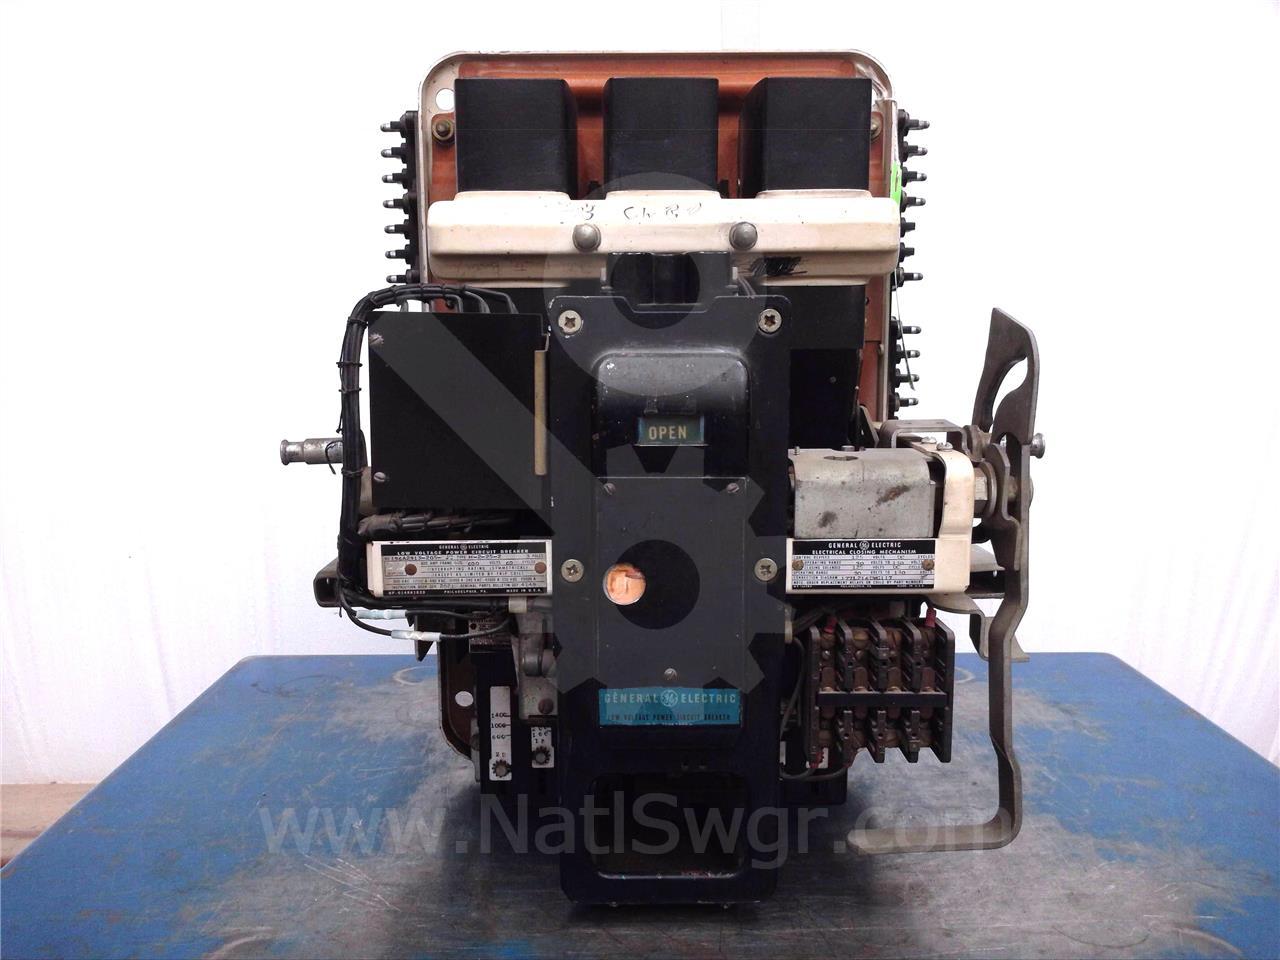 AK-2-25 600A GE / General Electric EO/DO 125VDC CONTROL, EC-1 200A 1B-2B-3